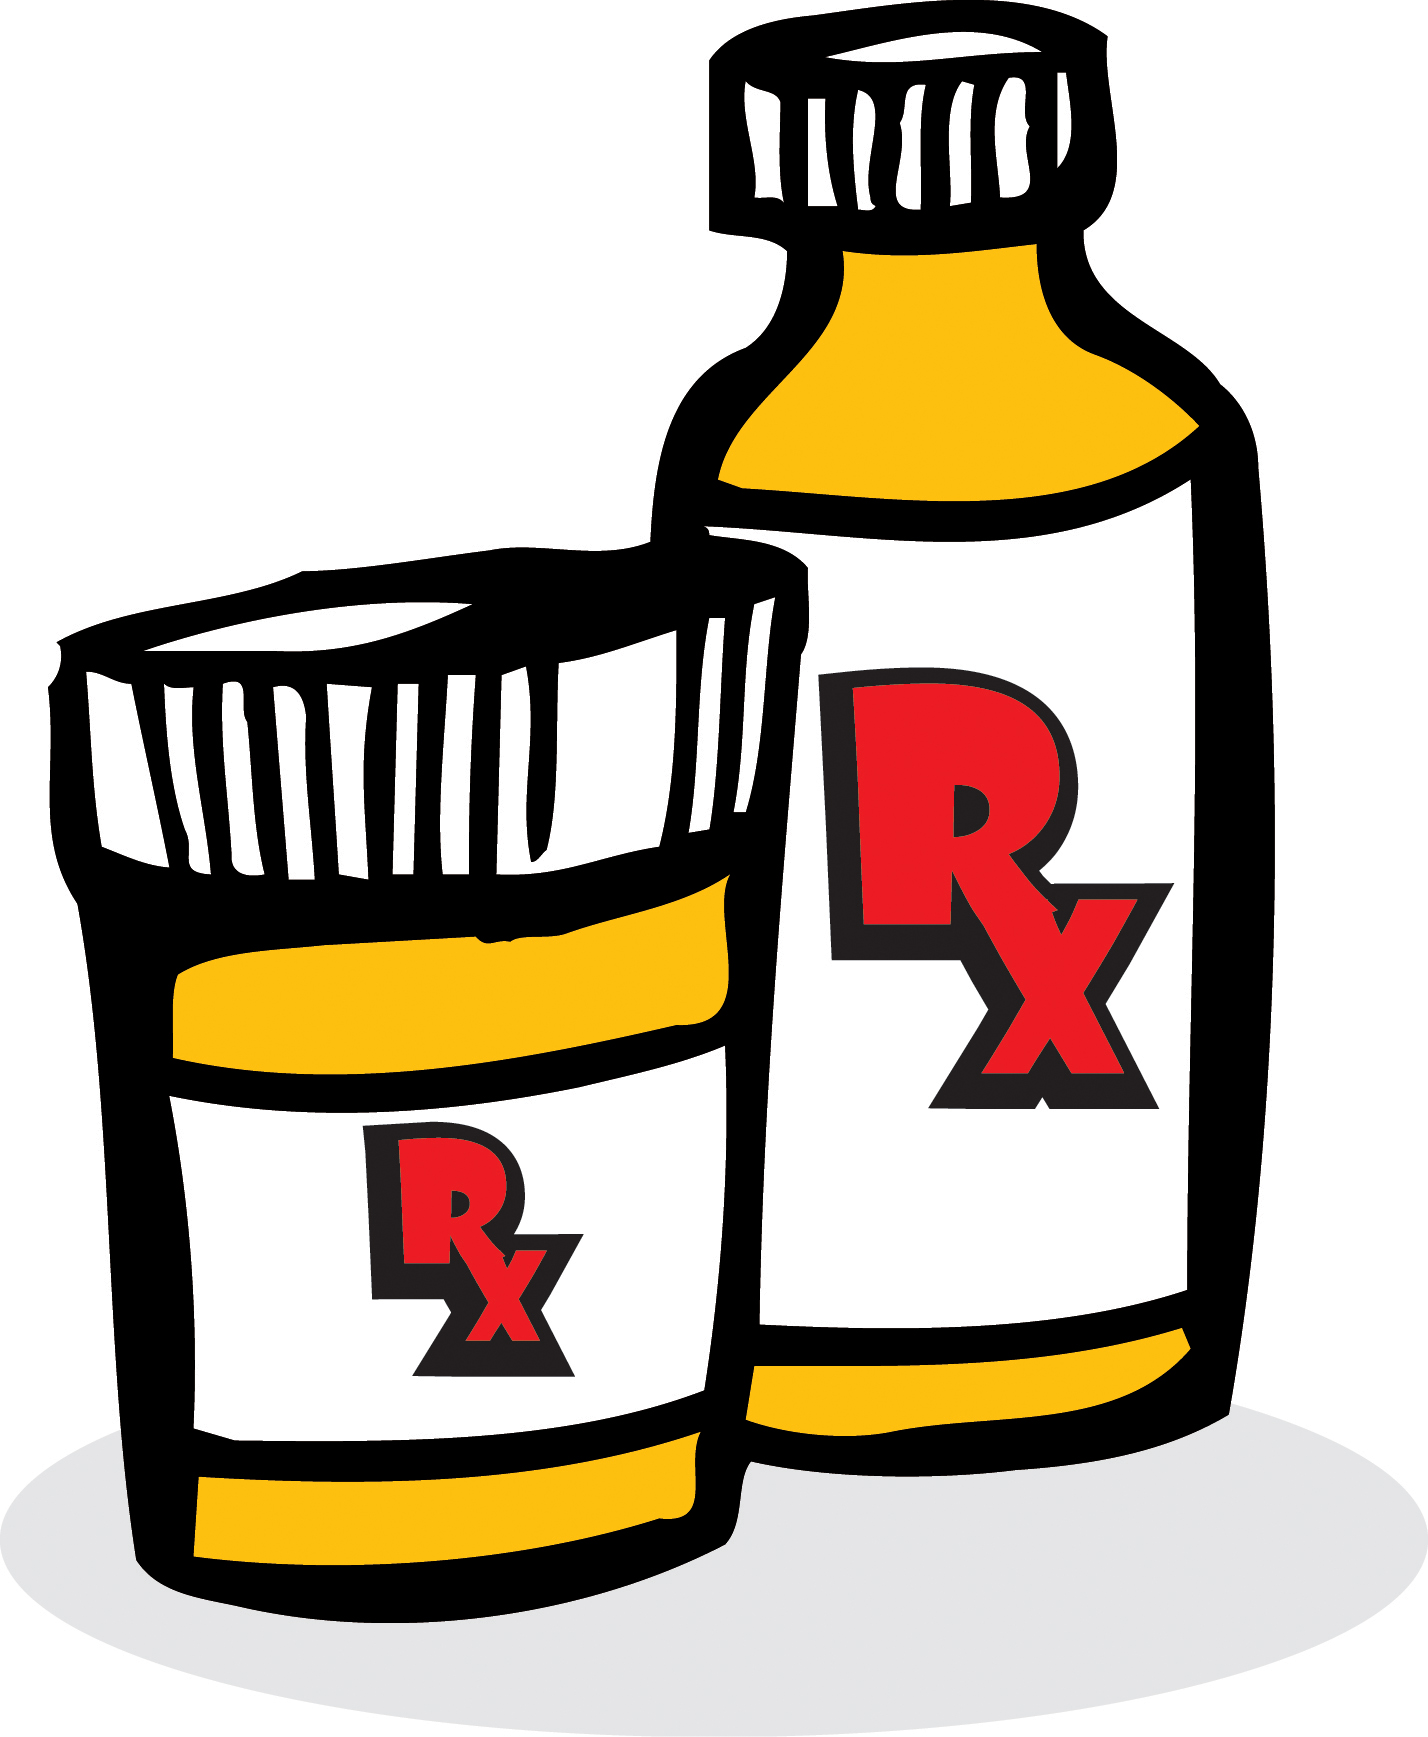 Prescription bottle clip art. Drugs clipart medicine drug